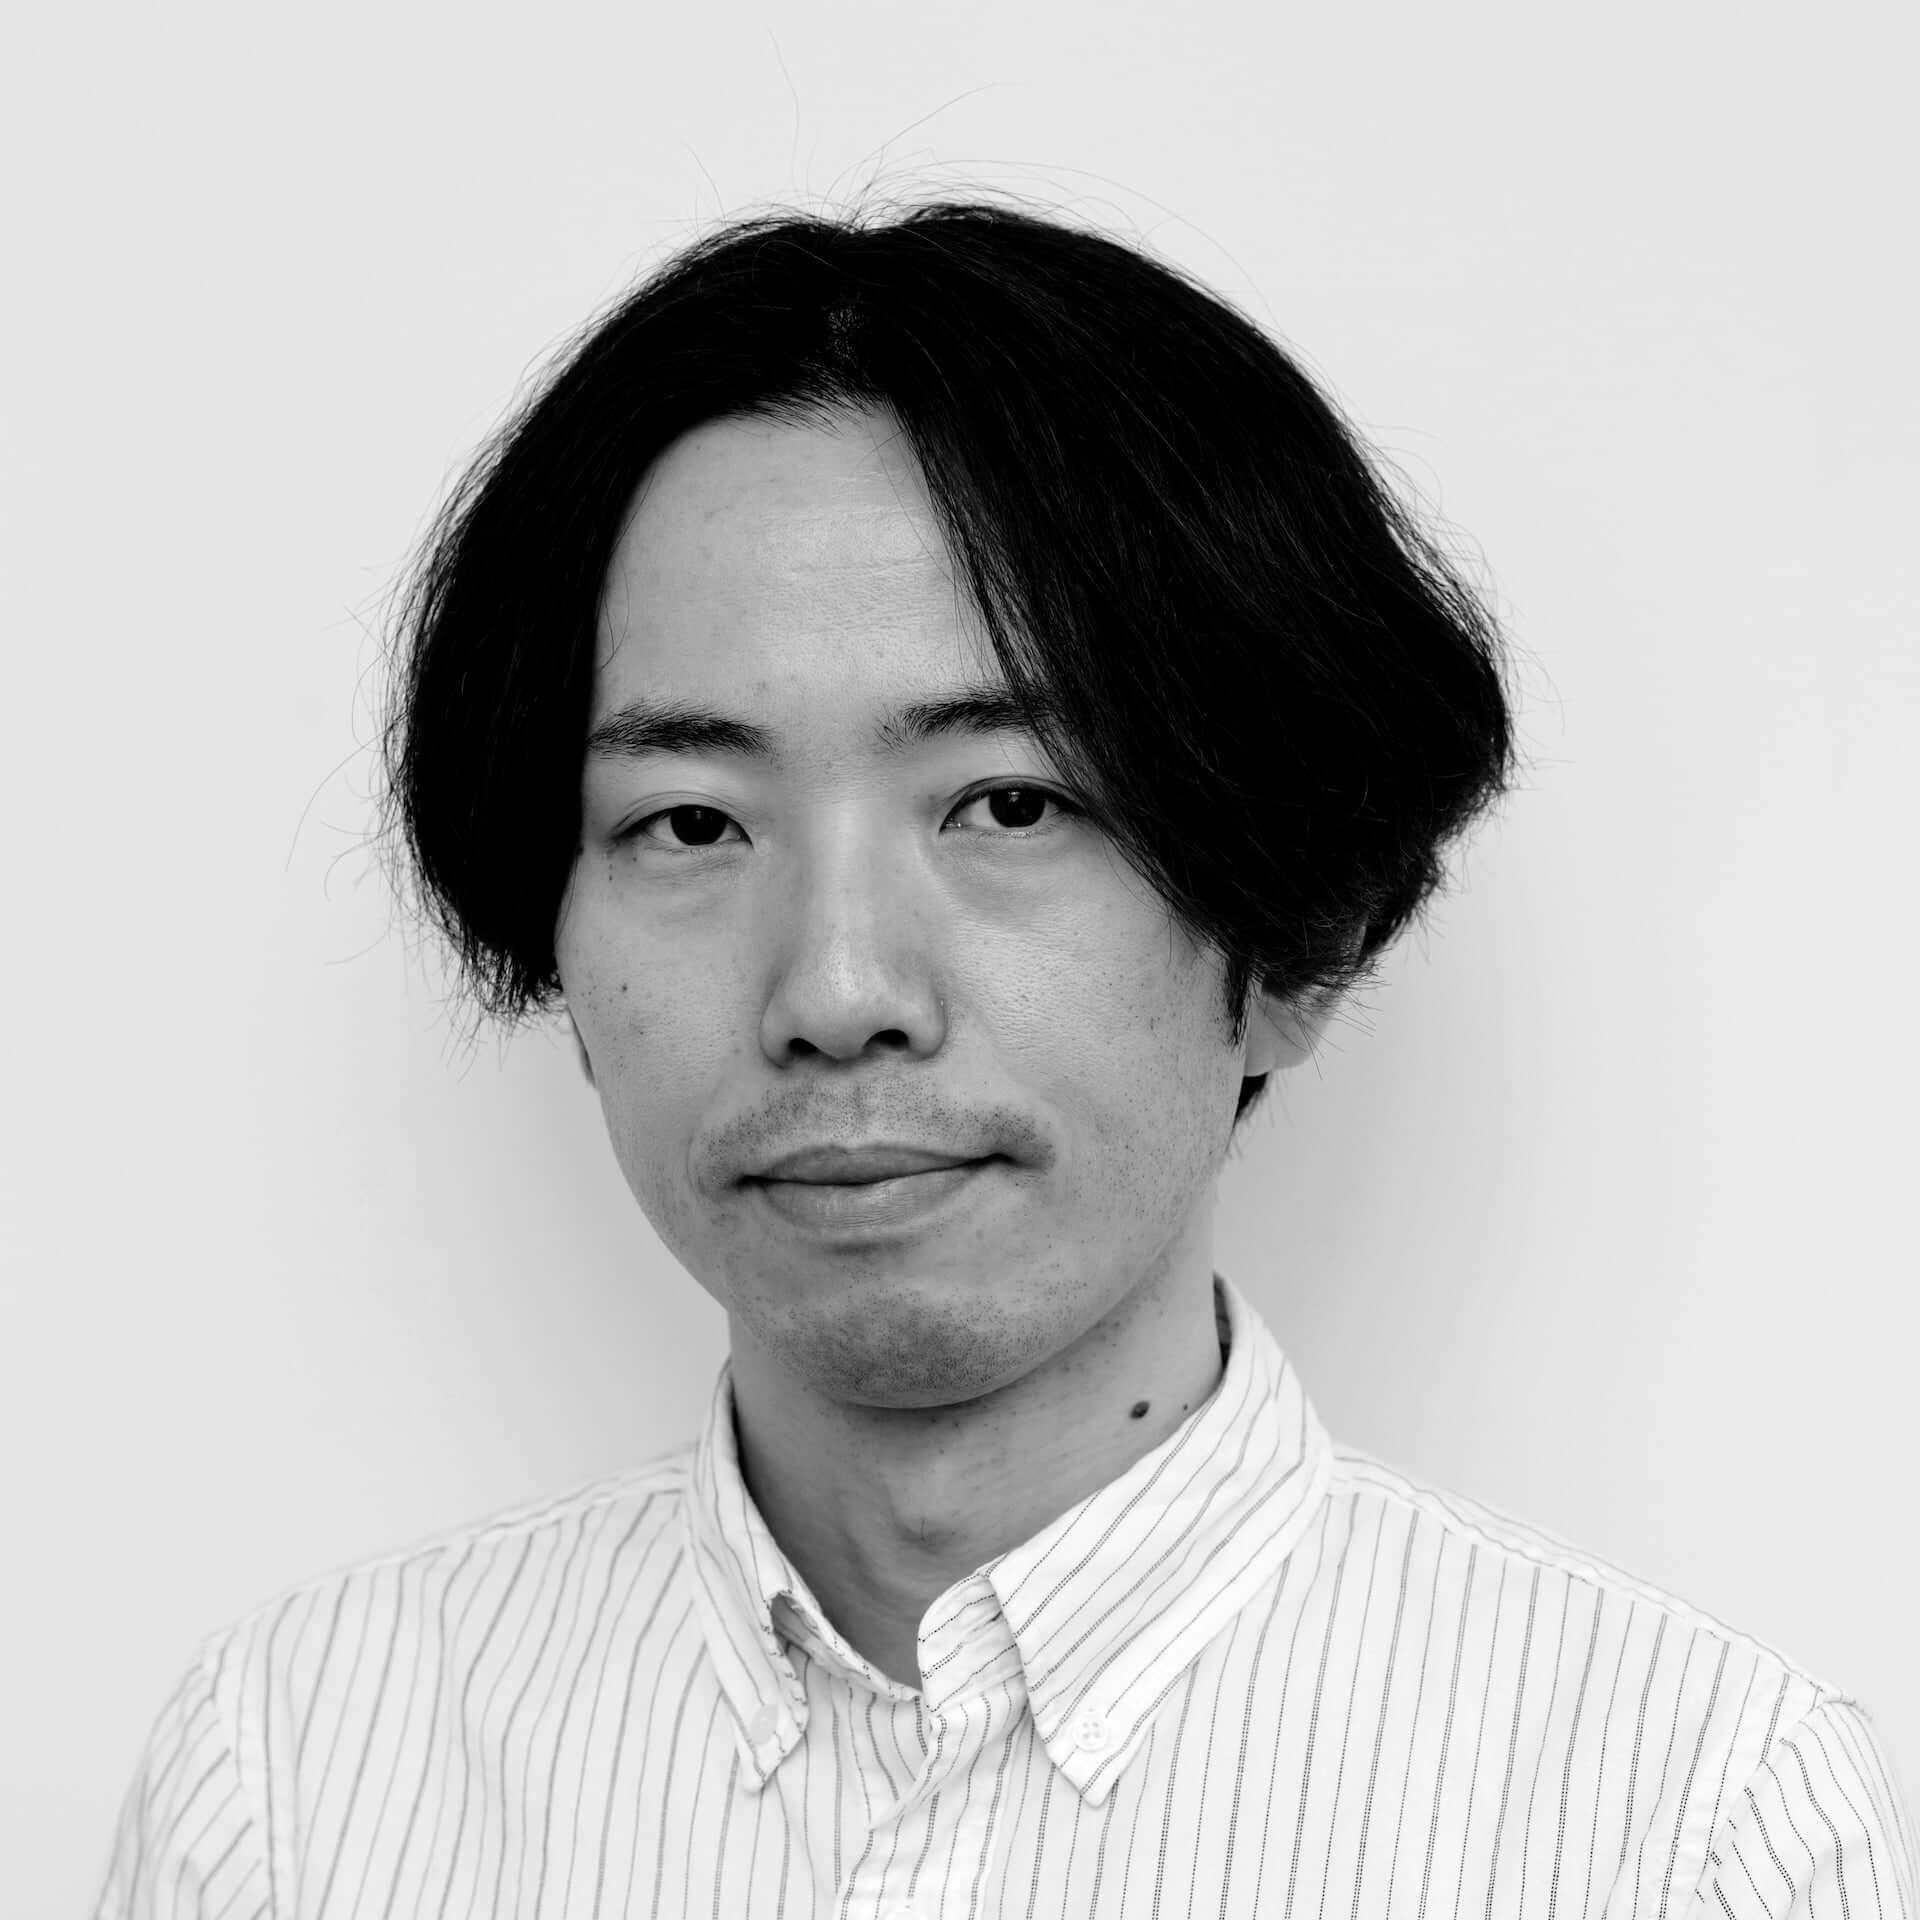 Rhizomatiks主催のオンラインイベント<Staying TOKYO>に長谷川祐子とOlafur Eliassonが参加決定!Keijiro Takahashiと真鍋大度も出演 art200420_staying_tokyo_5-1920x1920